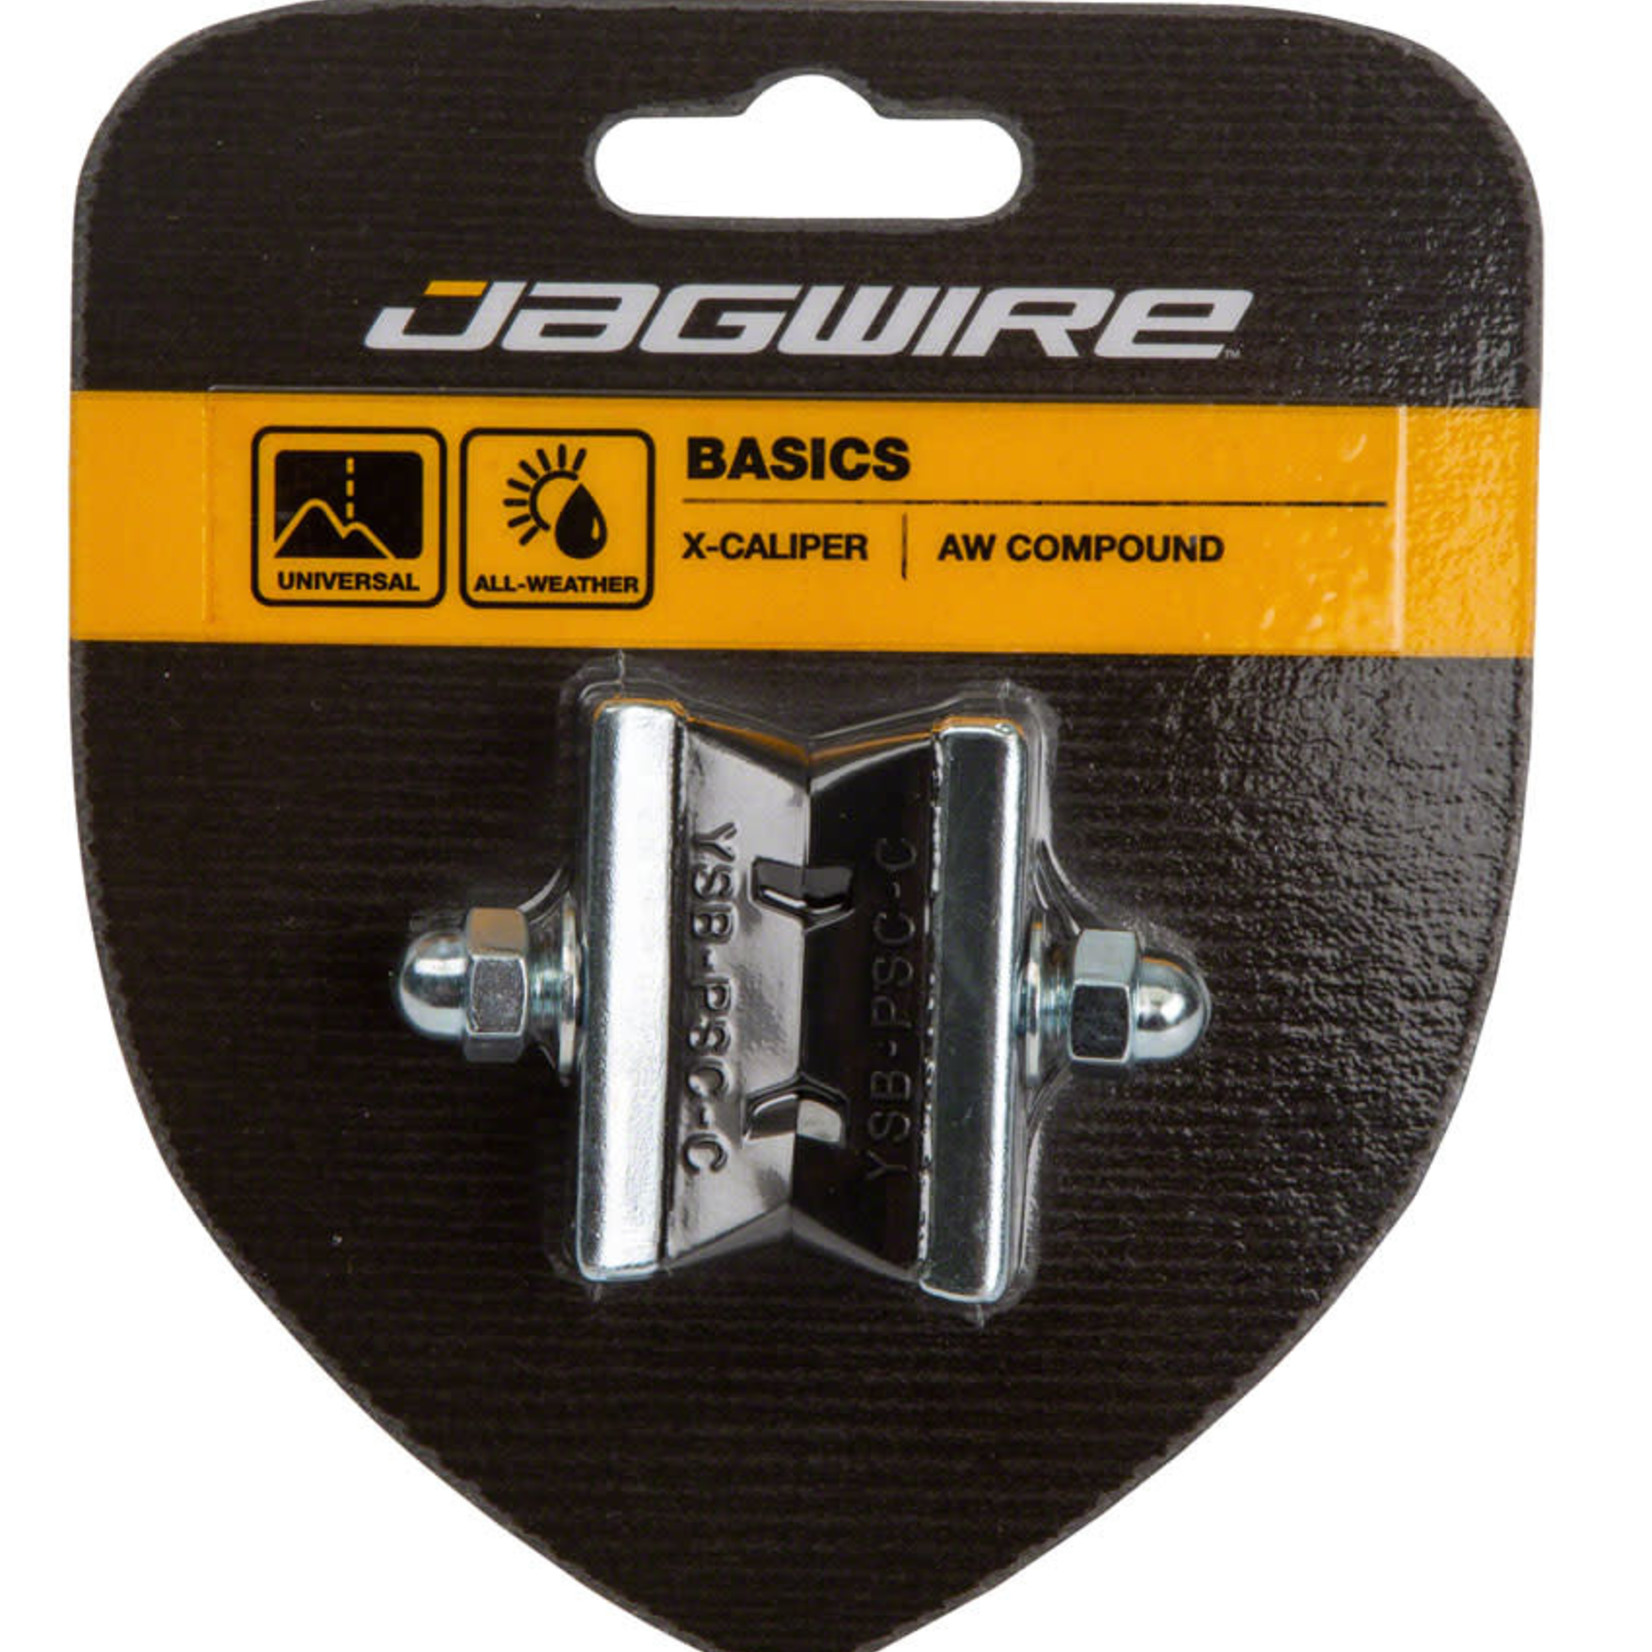 Jagwire Jagwire Basics X-Caliper Brake Pads - Threaded, Black, Pair